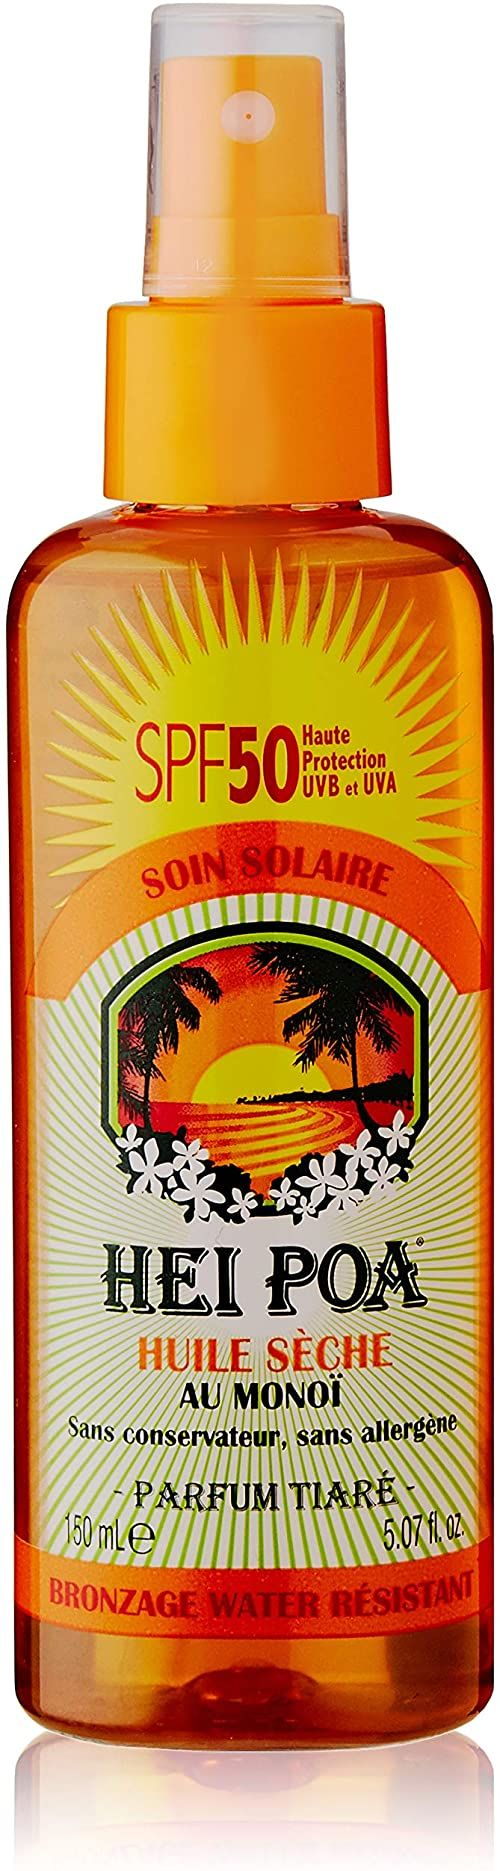 Hei Poa Body Sun Filter (suchy olej na monoï, LSF 50)  150 ml